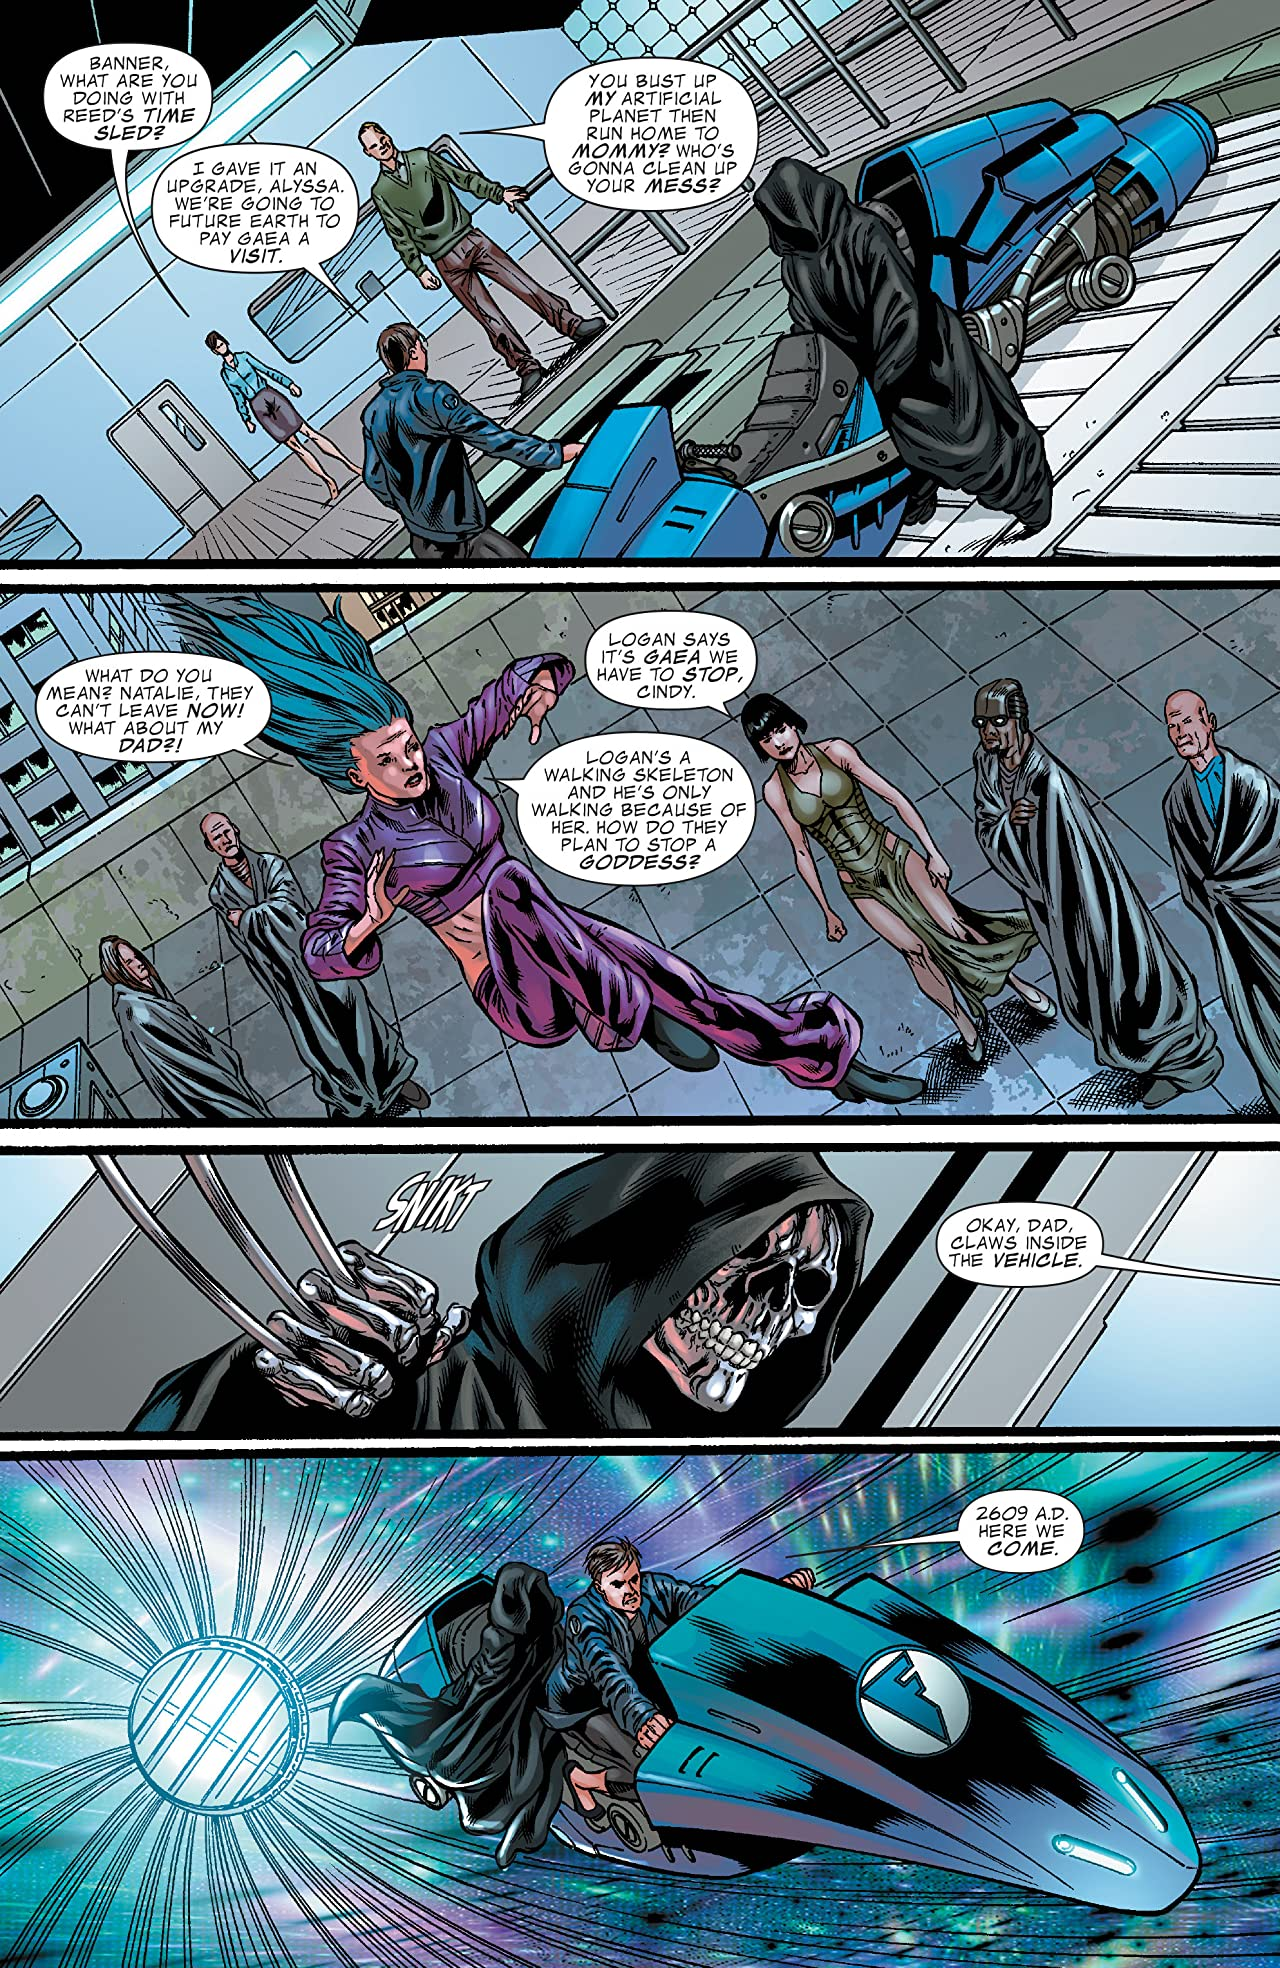 Fantastic Force (2009) #4 (of 4)